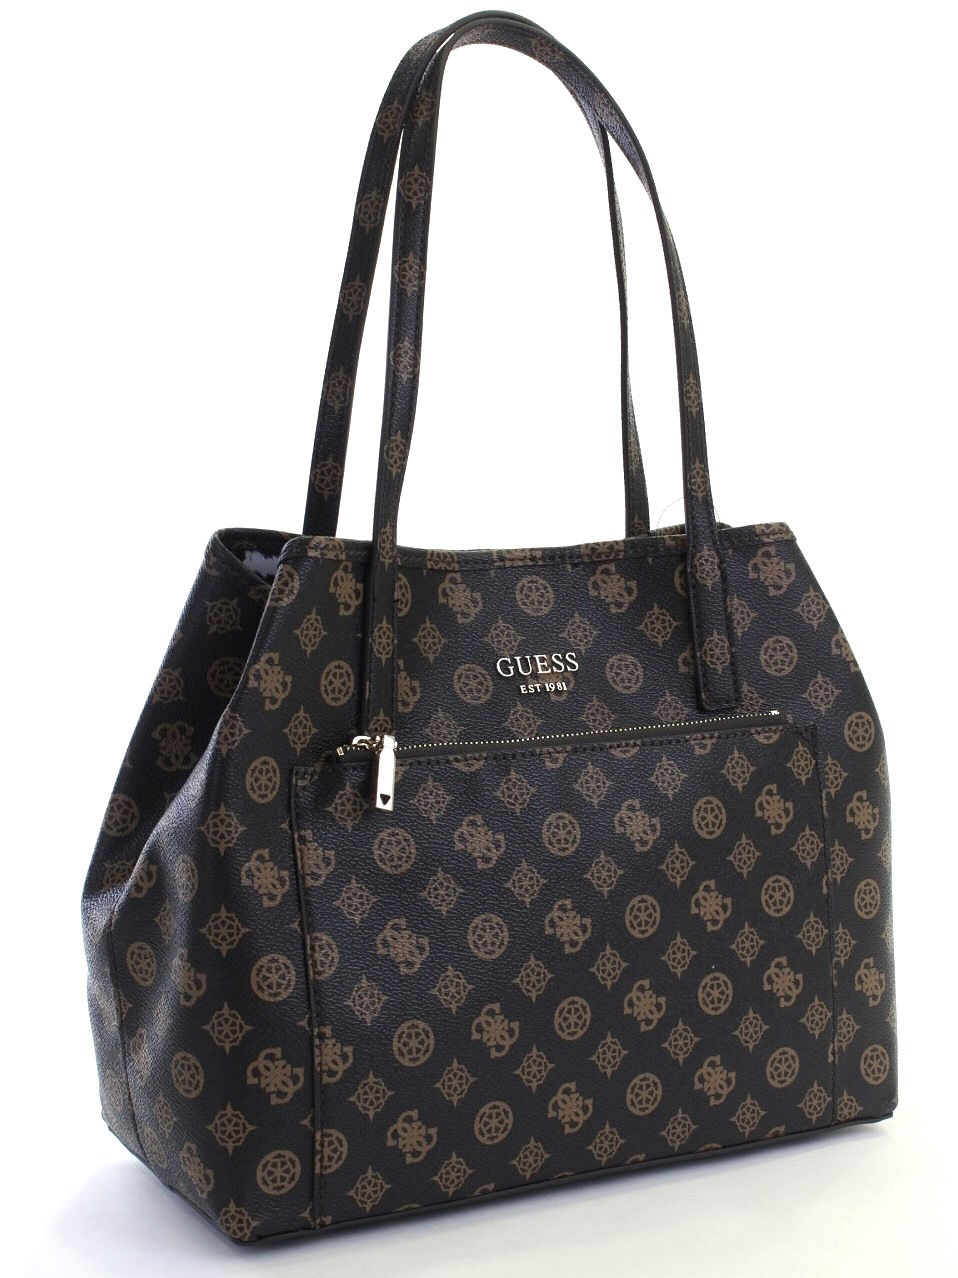 Handbags Guess - 465 HWPQ69 95250